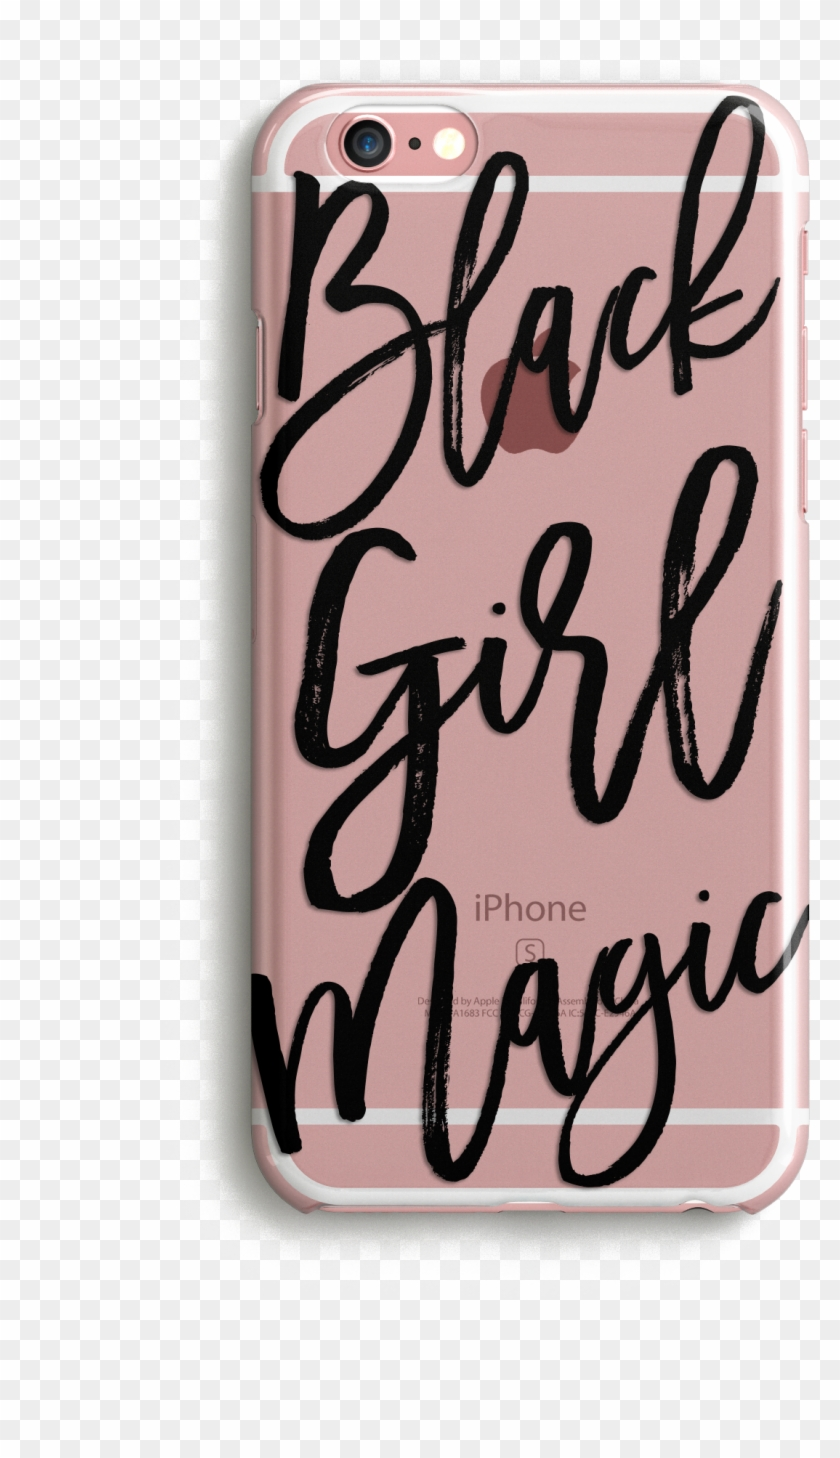 Black Girl Magic Phone Case - Mobile Phone Clipart #3398846